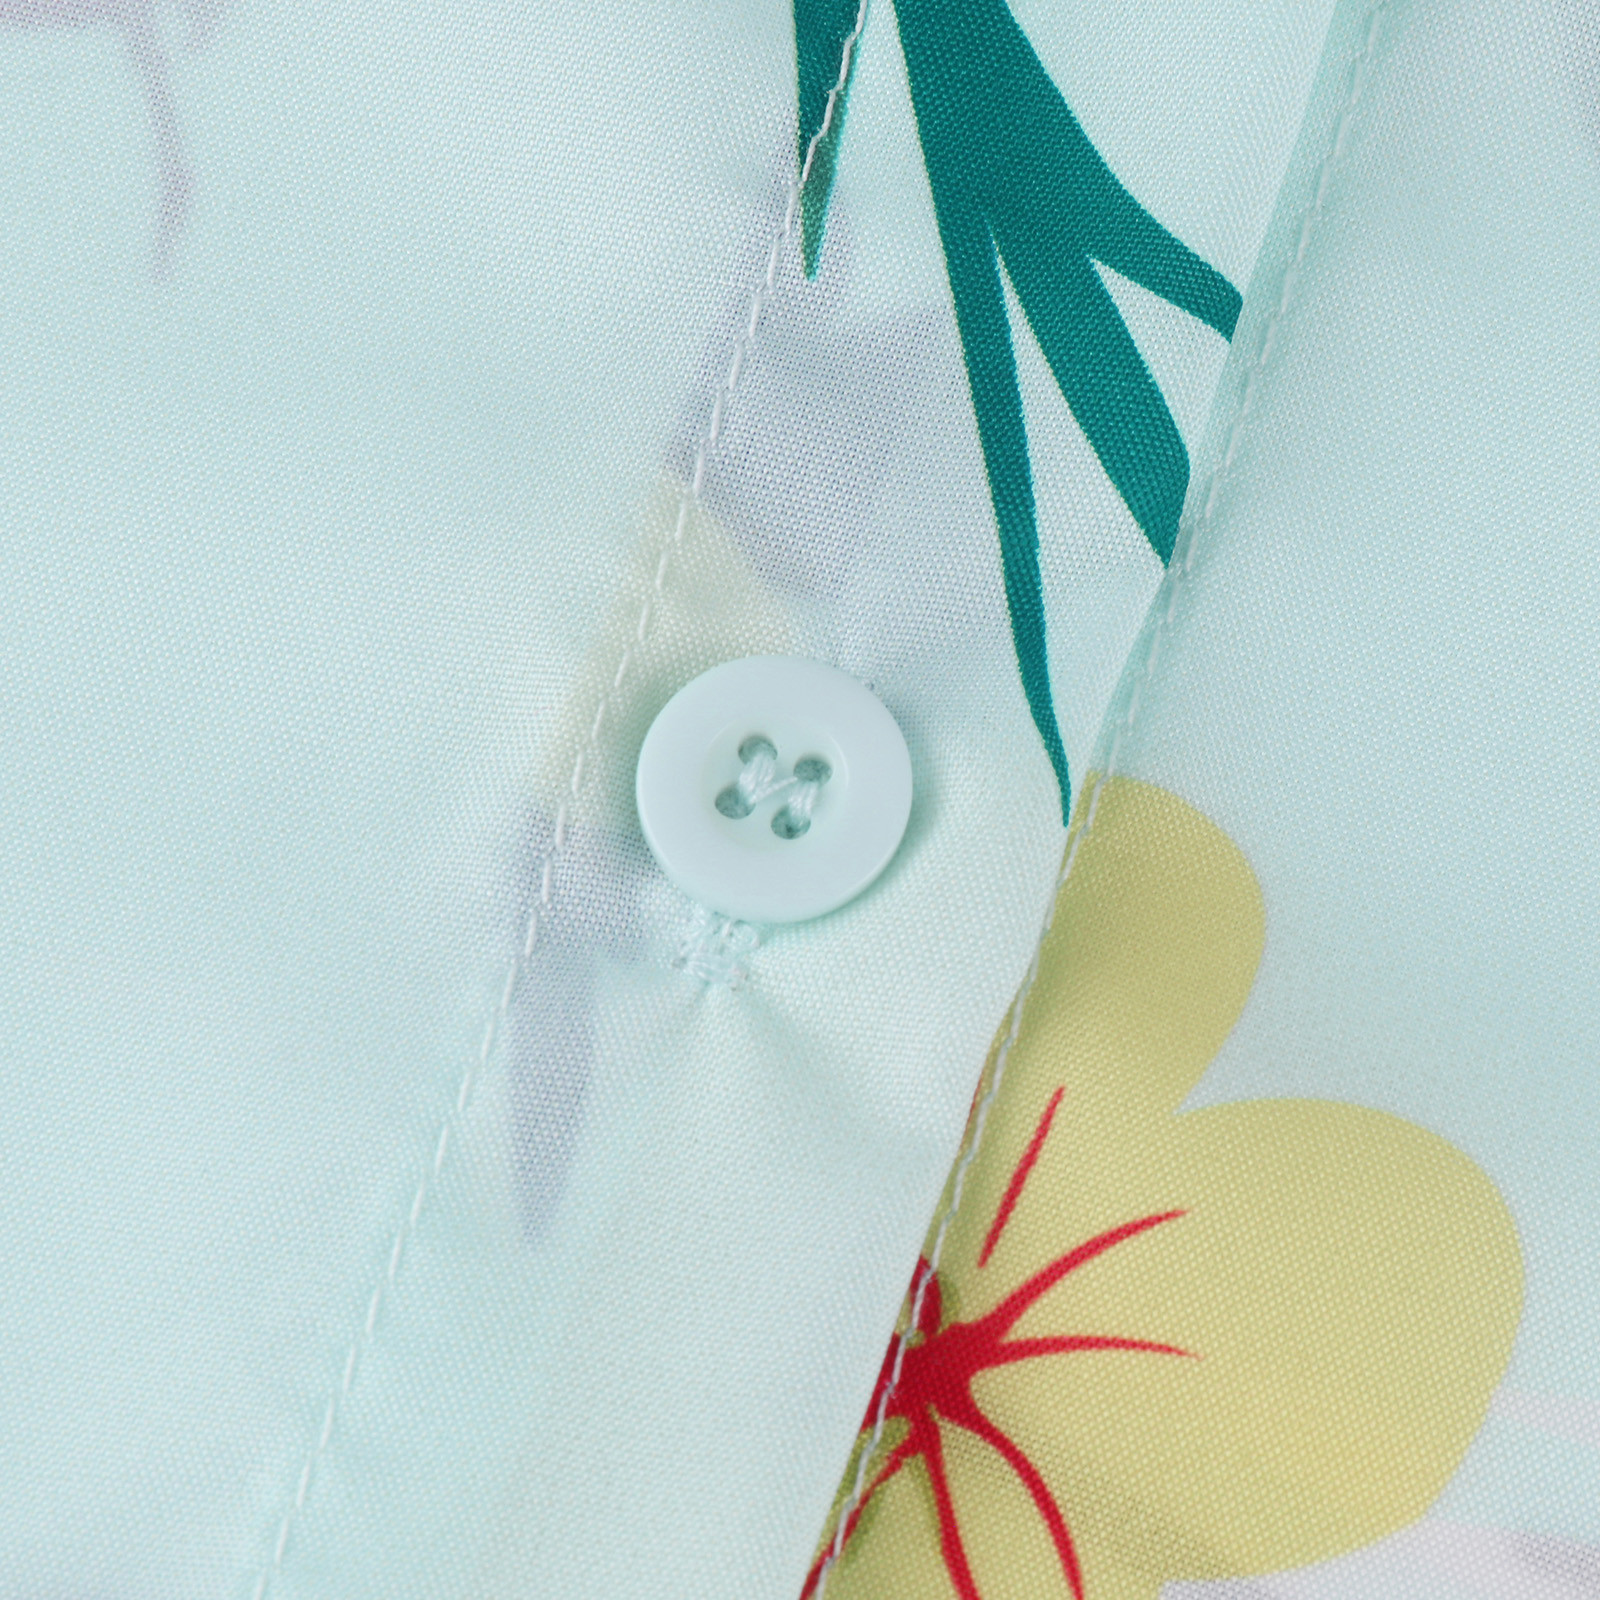 Bohemia Vintage Shirts Women Flower Printed Long Sleeve Casual Shirt Chiffon Button Blouse Summer Femme Tops Blusa